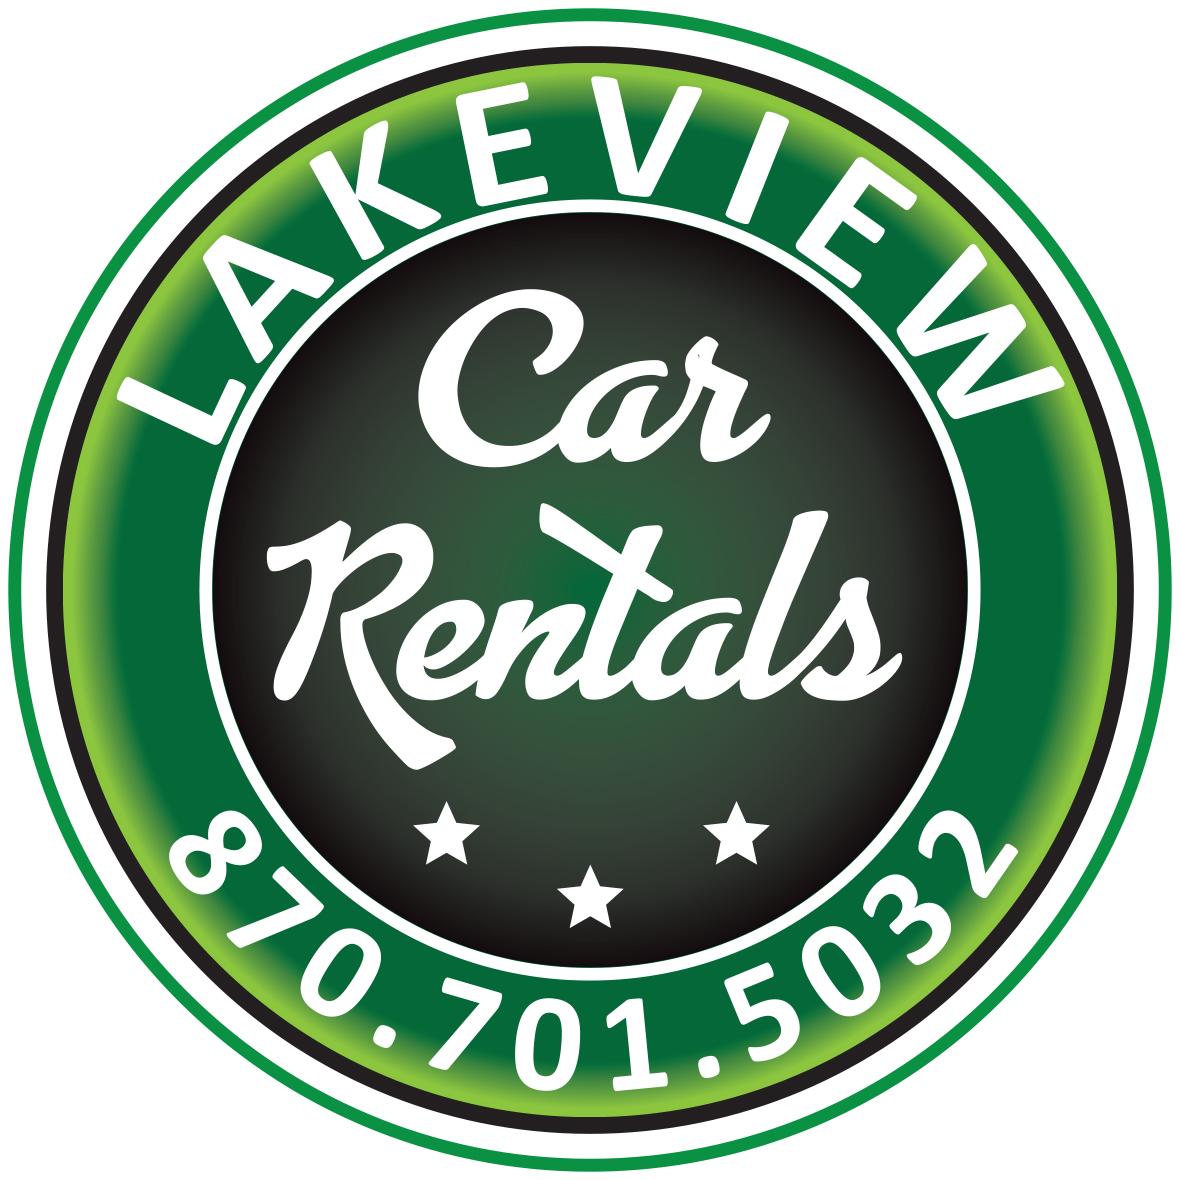 Lakeview Car Rentals